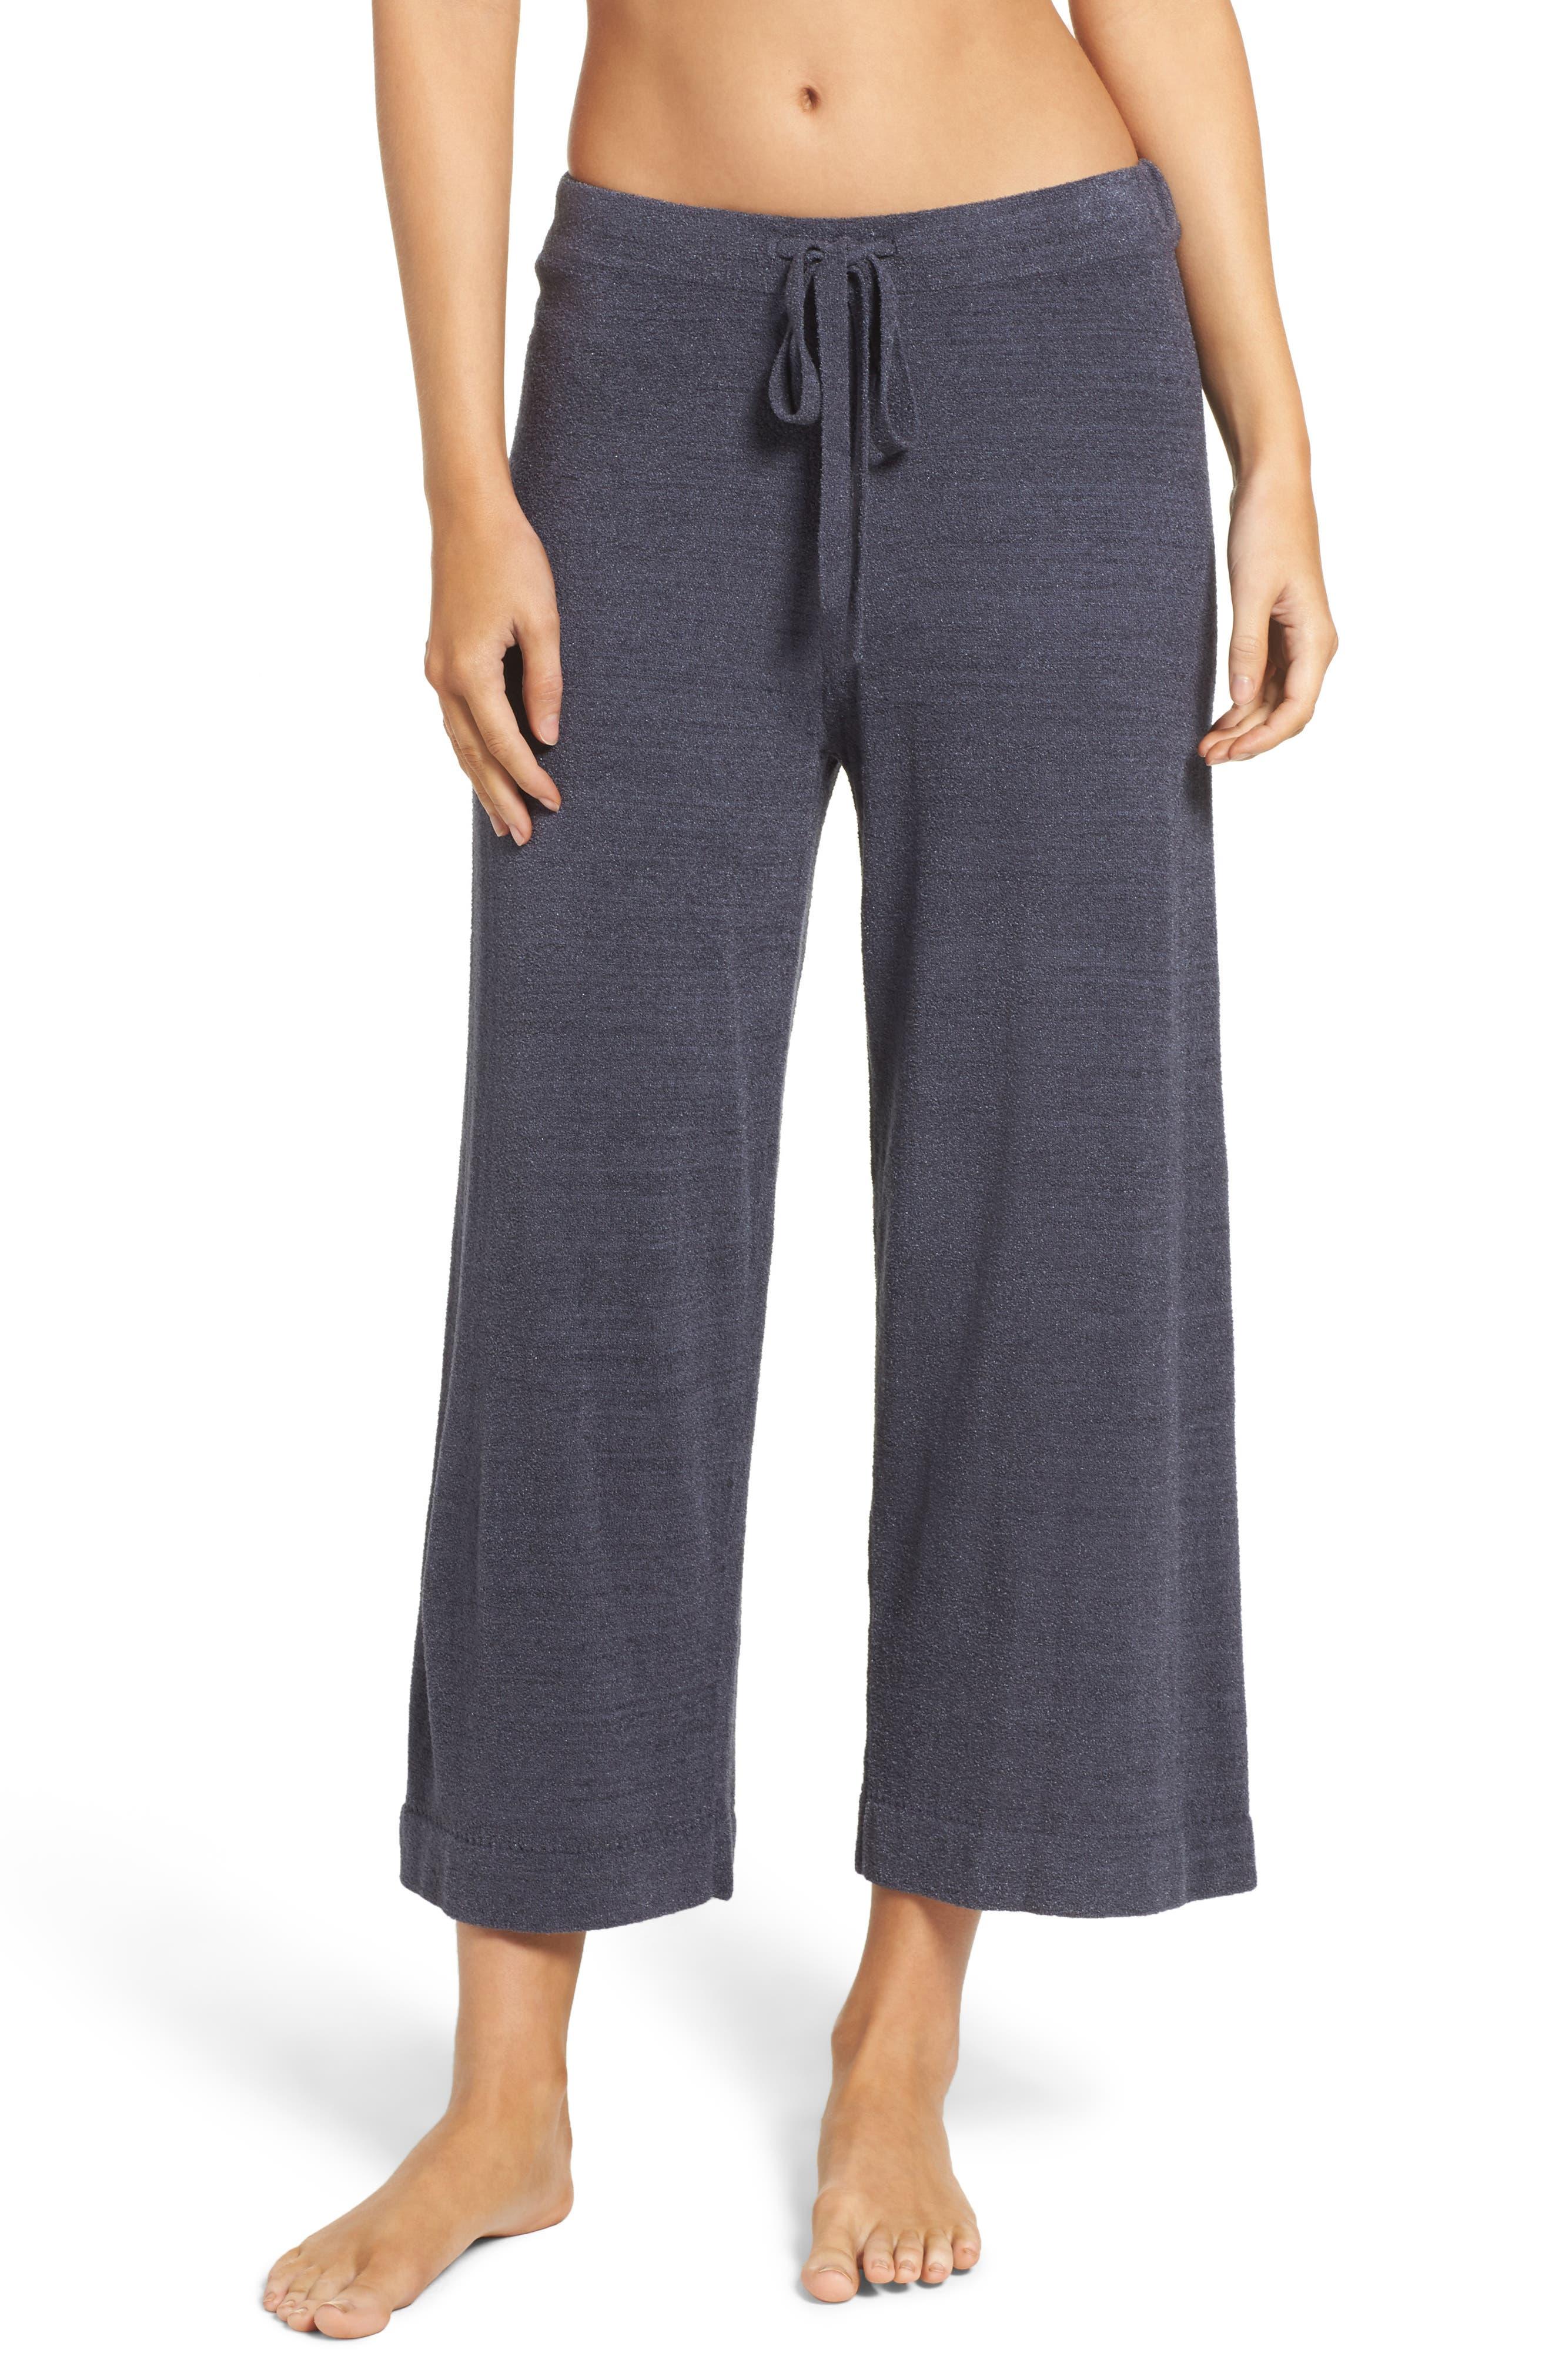 Women's Barefoot Dreams Cozychic Ultra Lite Culotte Lounge Pants